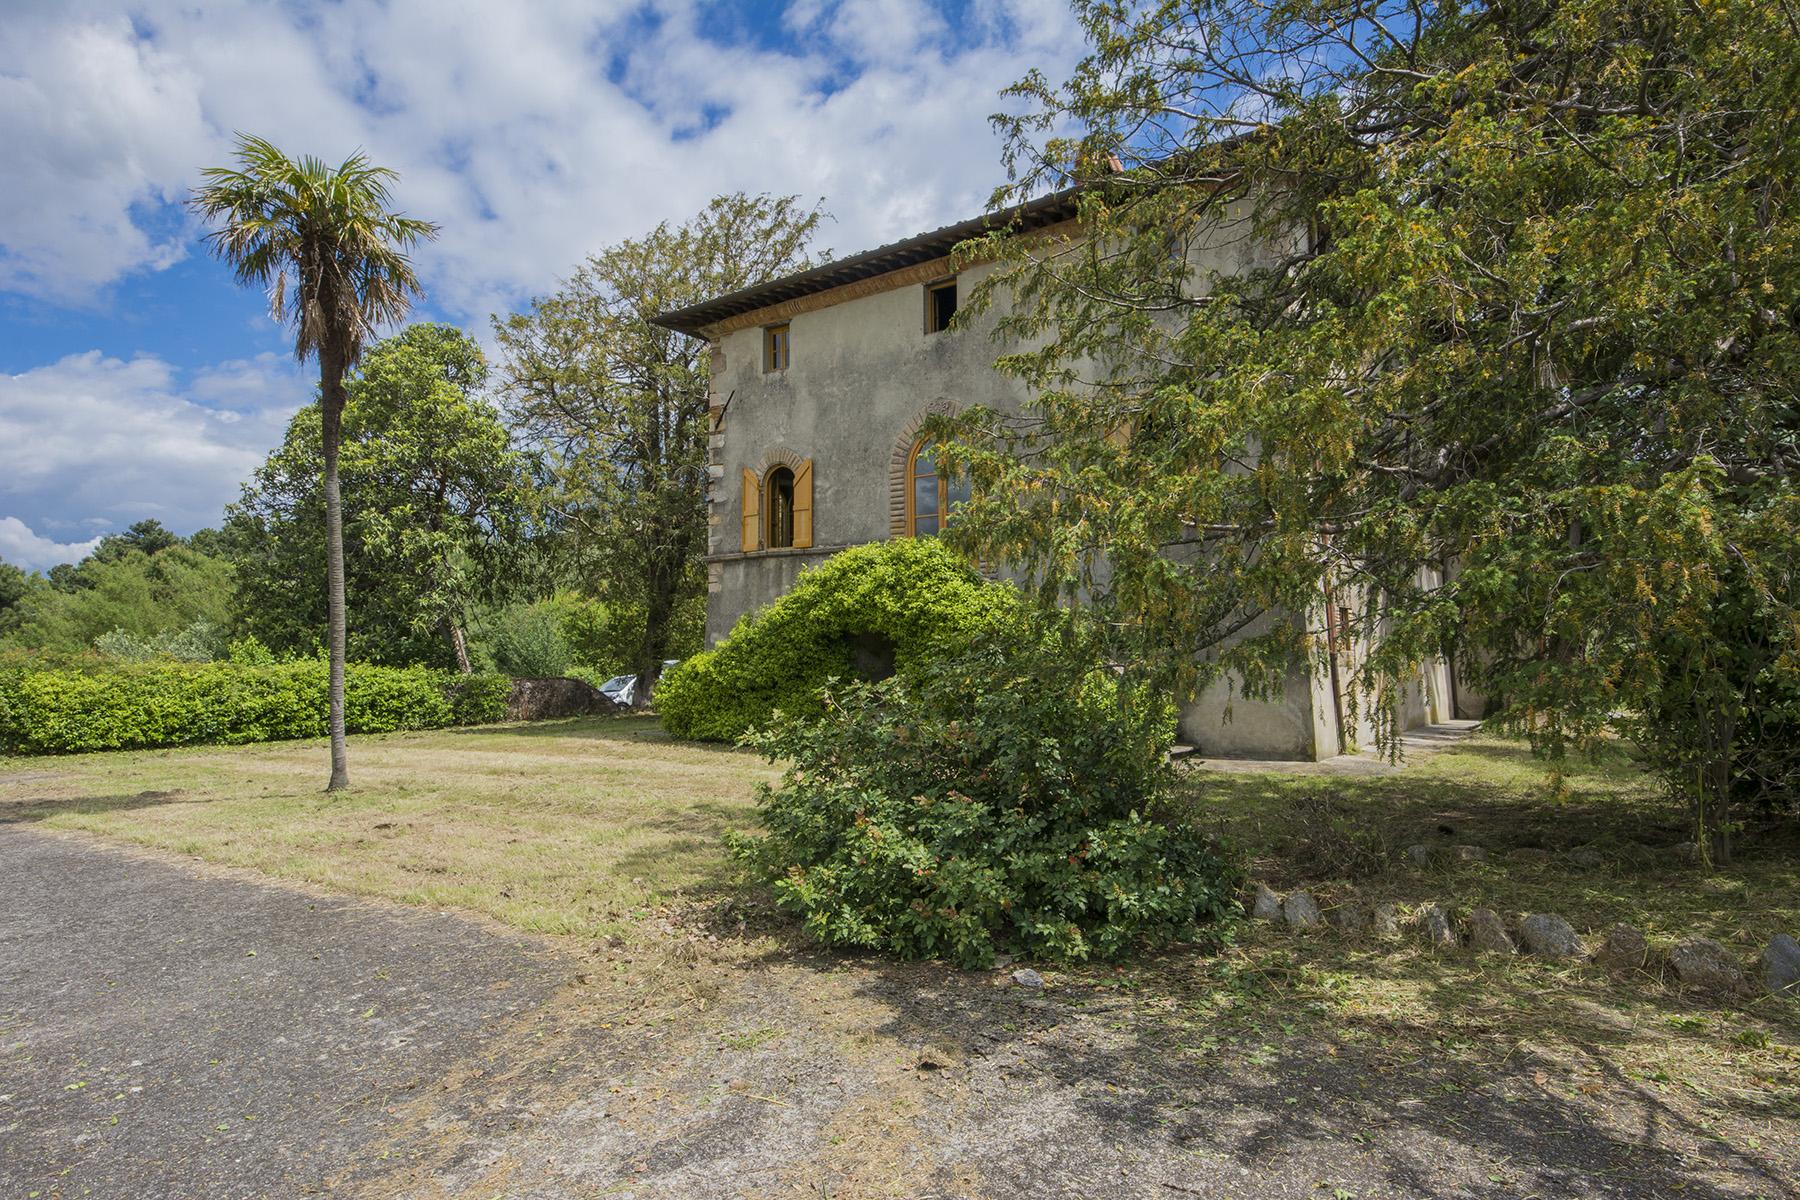 Villa in Vendita a Capannori: 5 locali, 490 mq - Foto 2